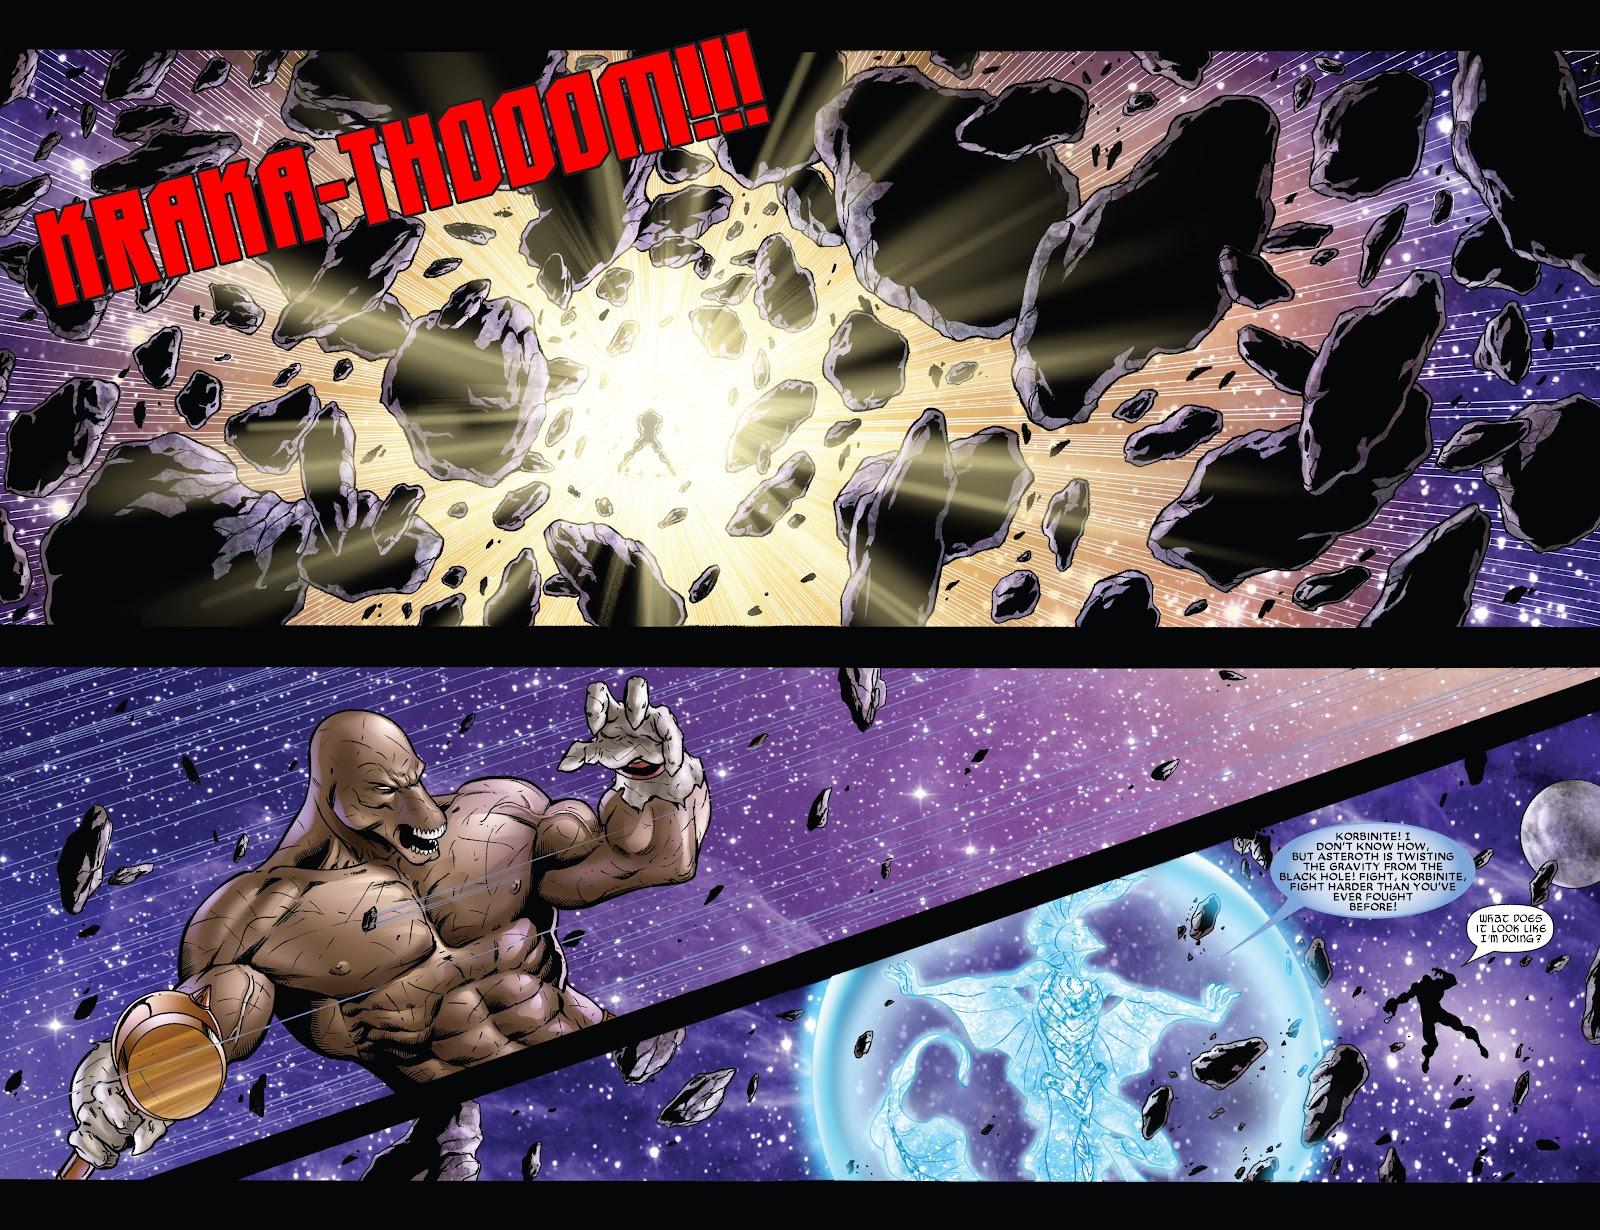 Read online Thor: Ragnaroks comic -  Issue # TPB (Part 4) - 43